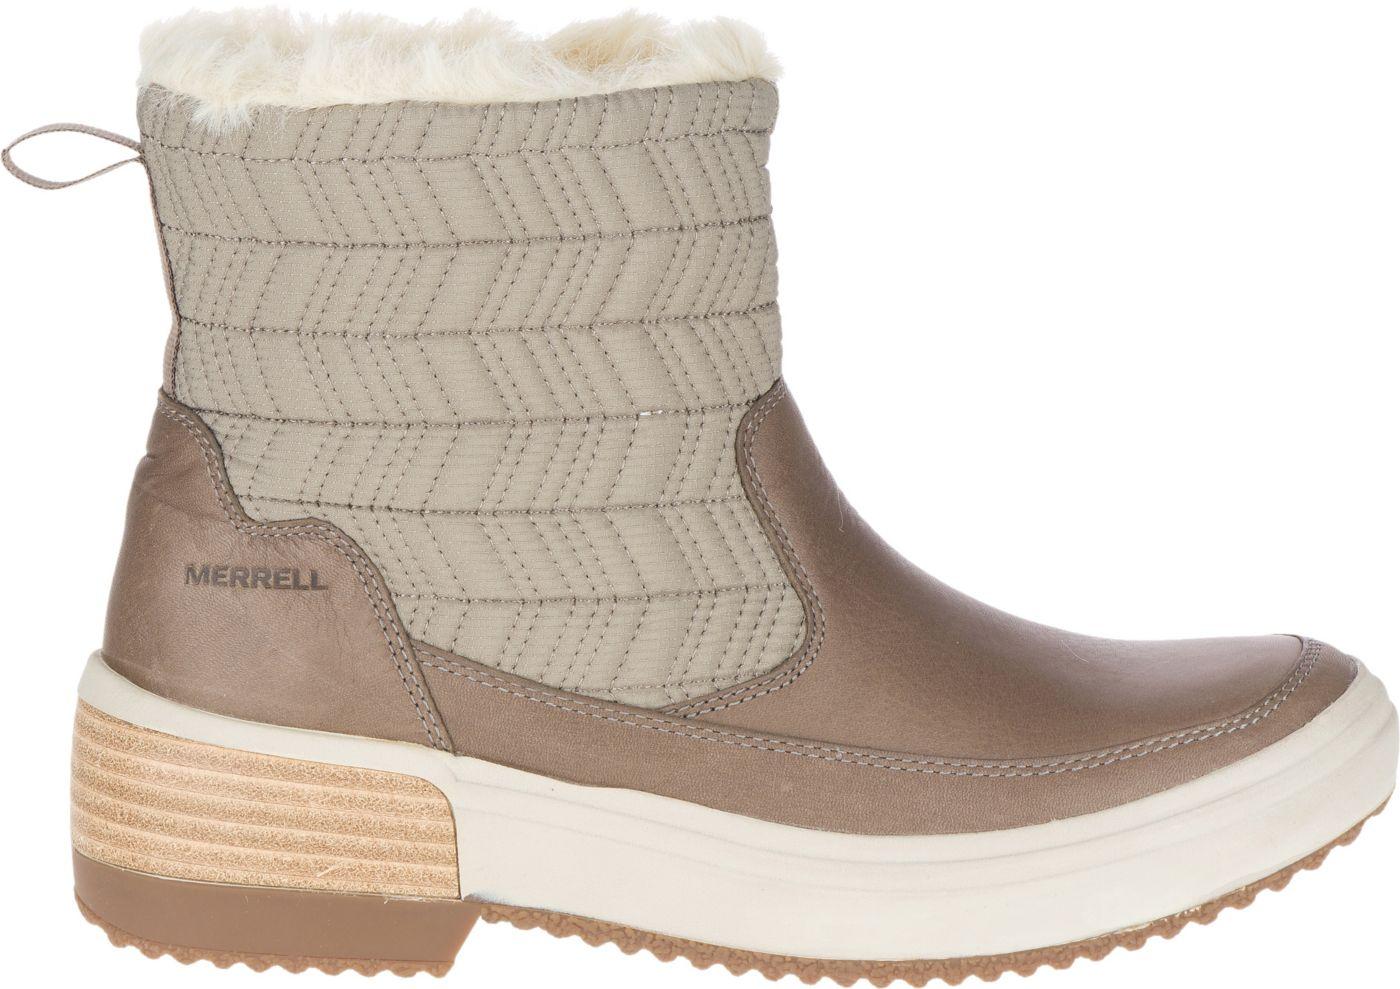 Merrell Women's Haven Bluff Polar Waterproof Boots